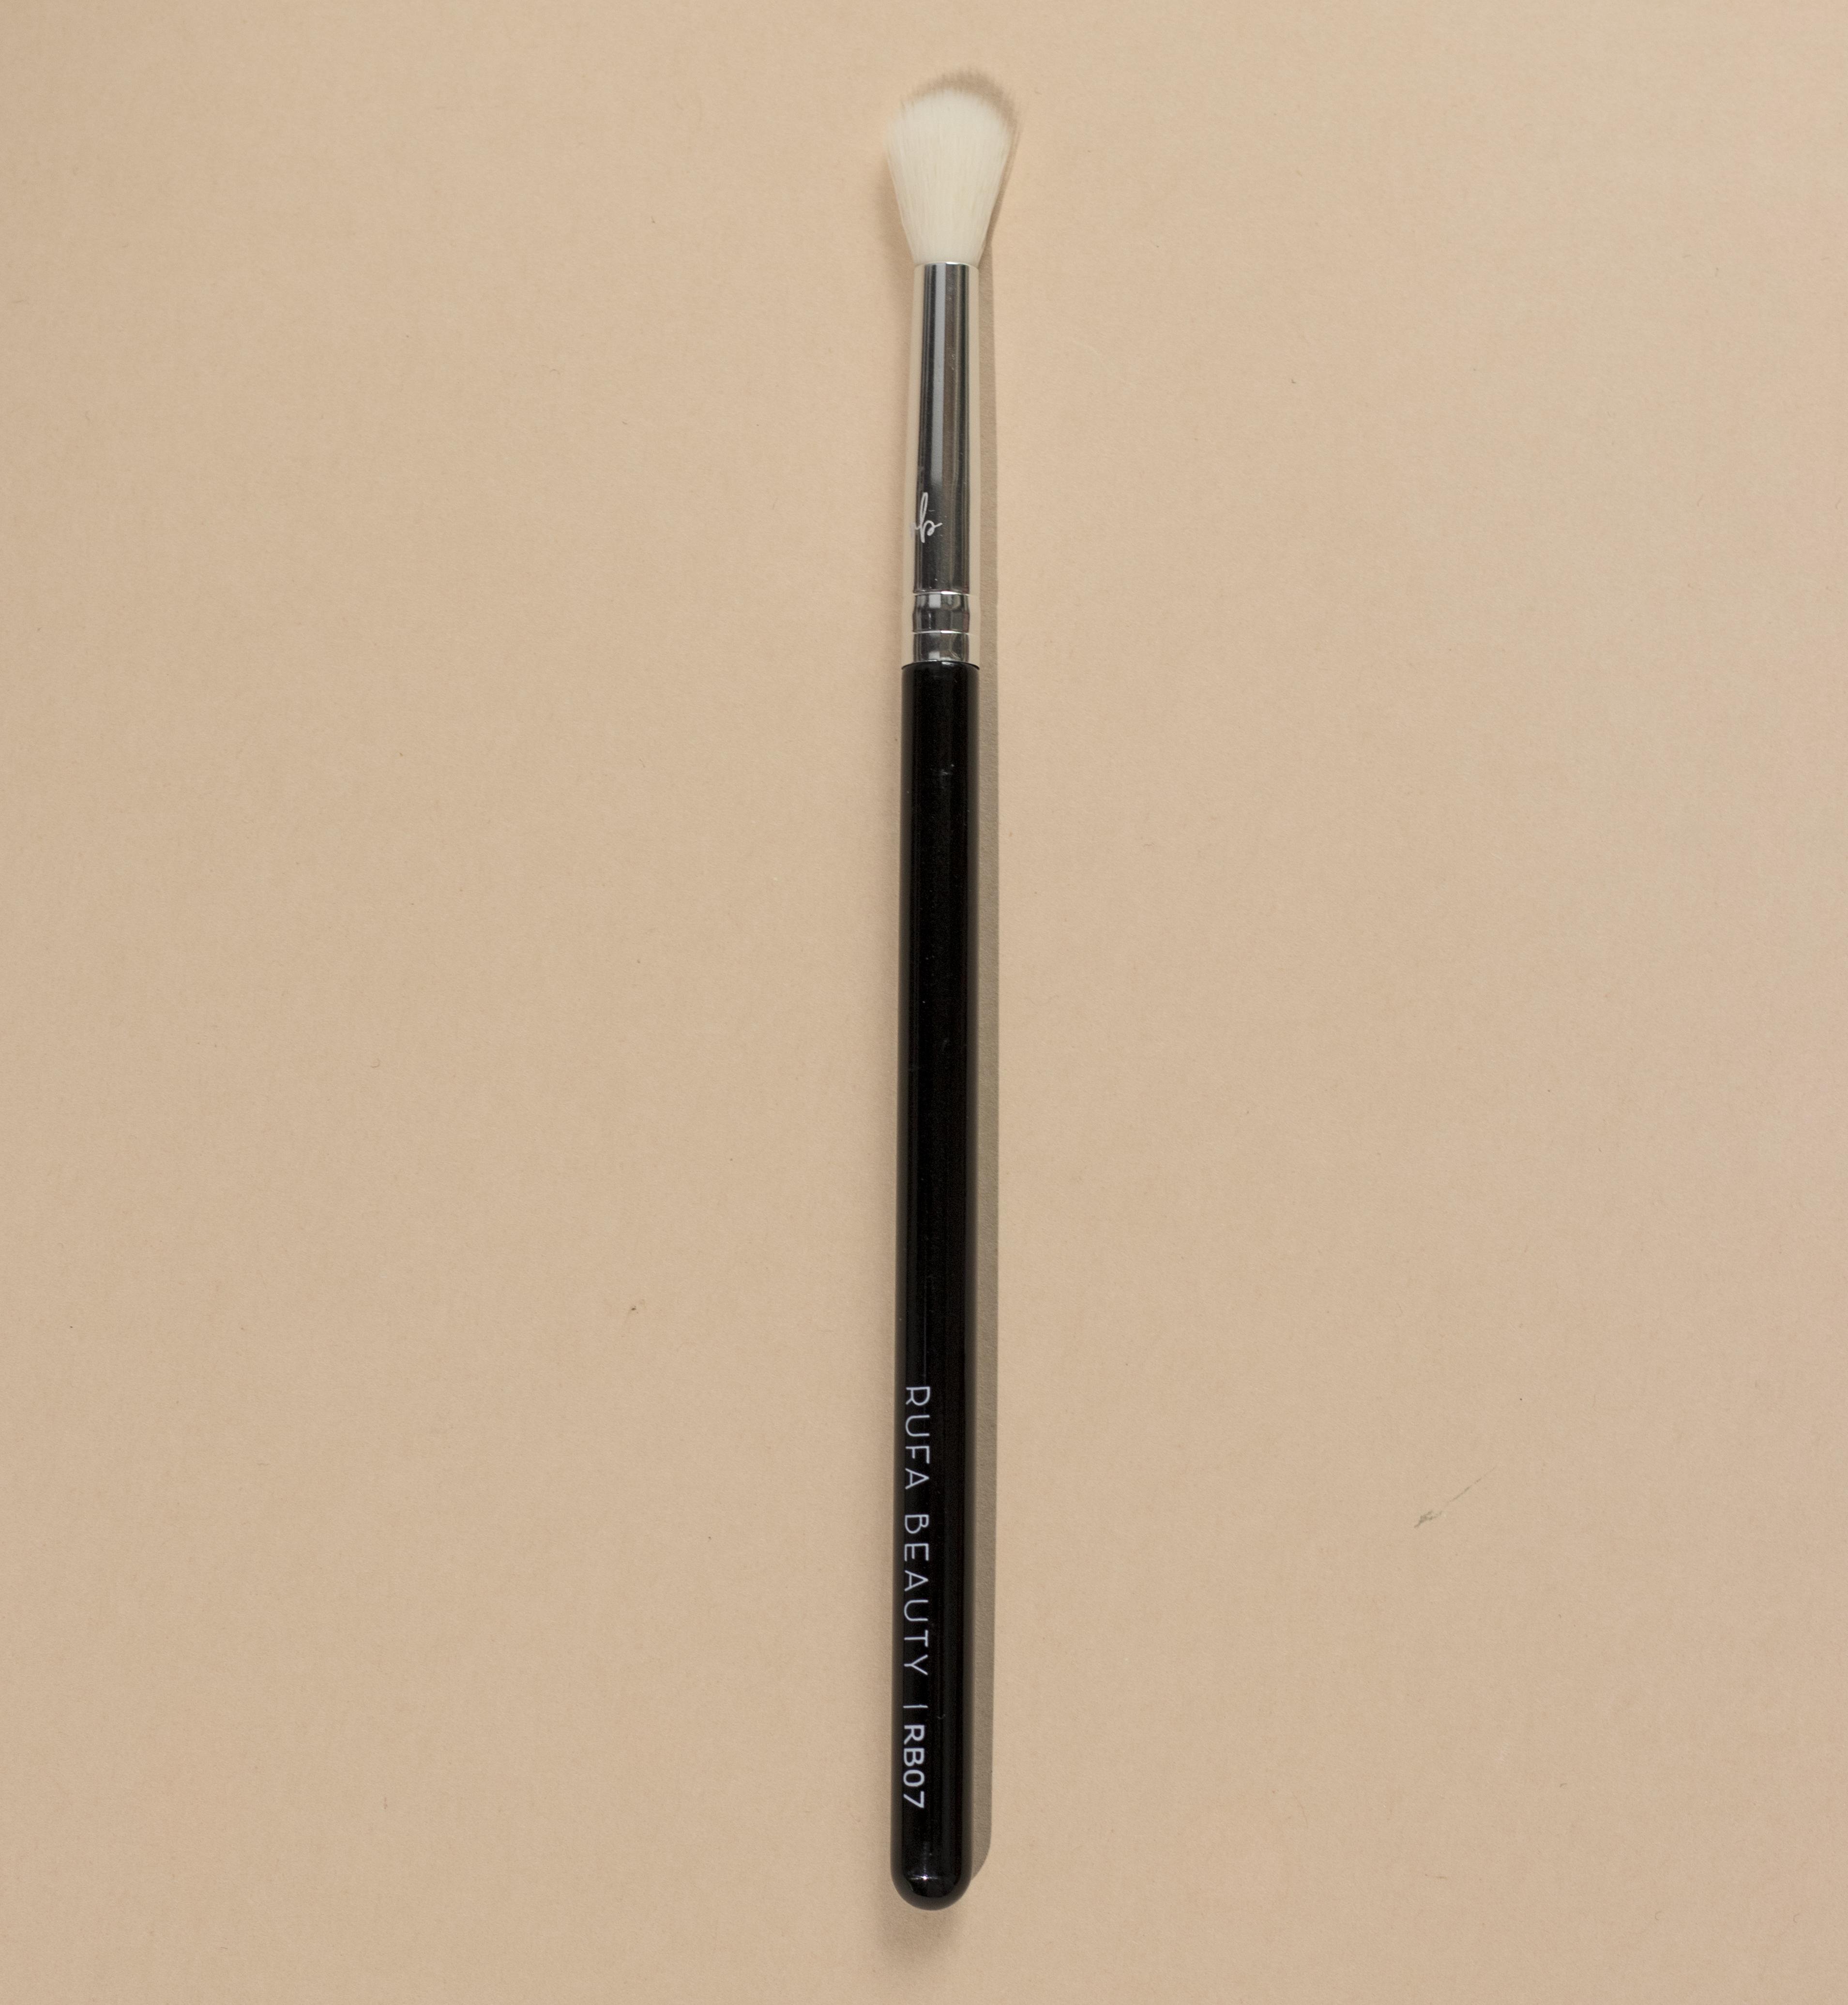 Eyeshadow Blending Brush RB07